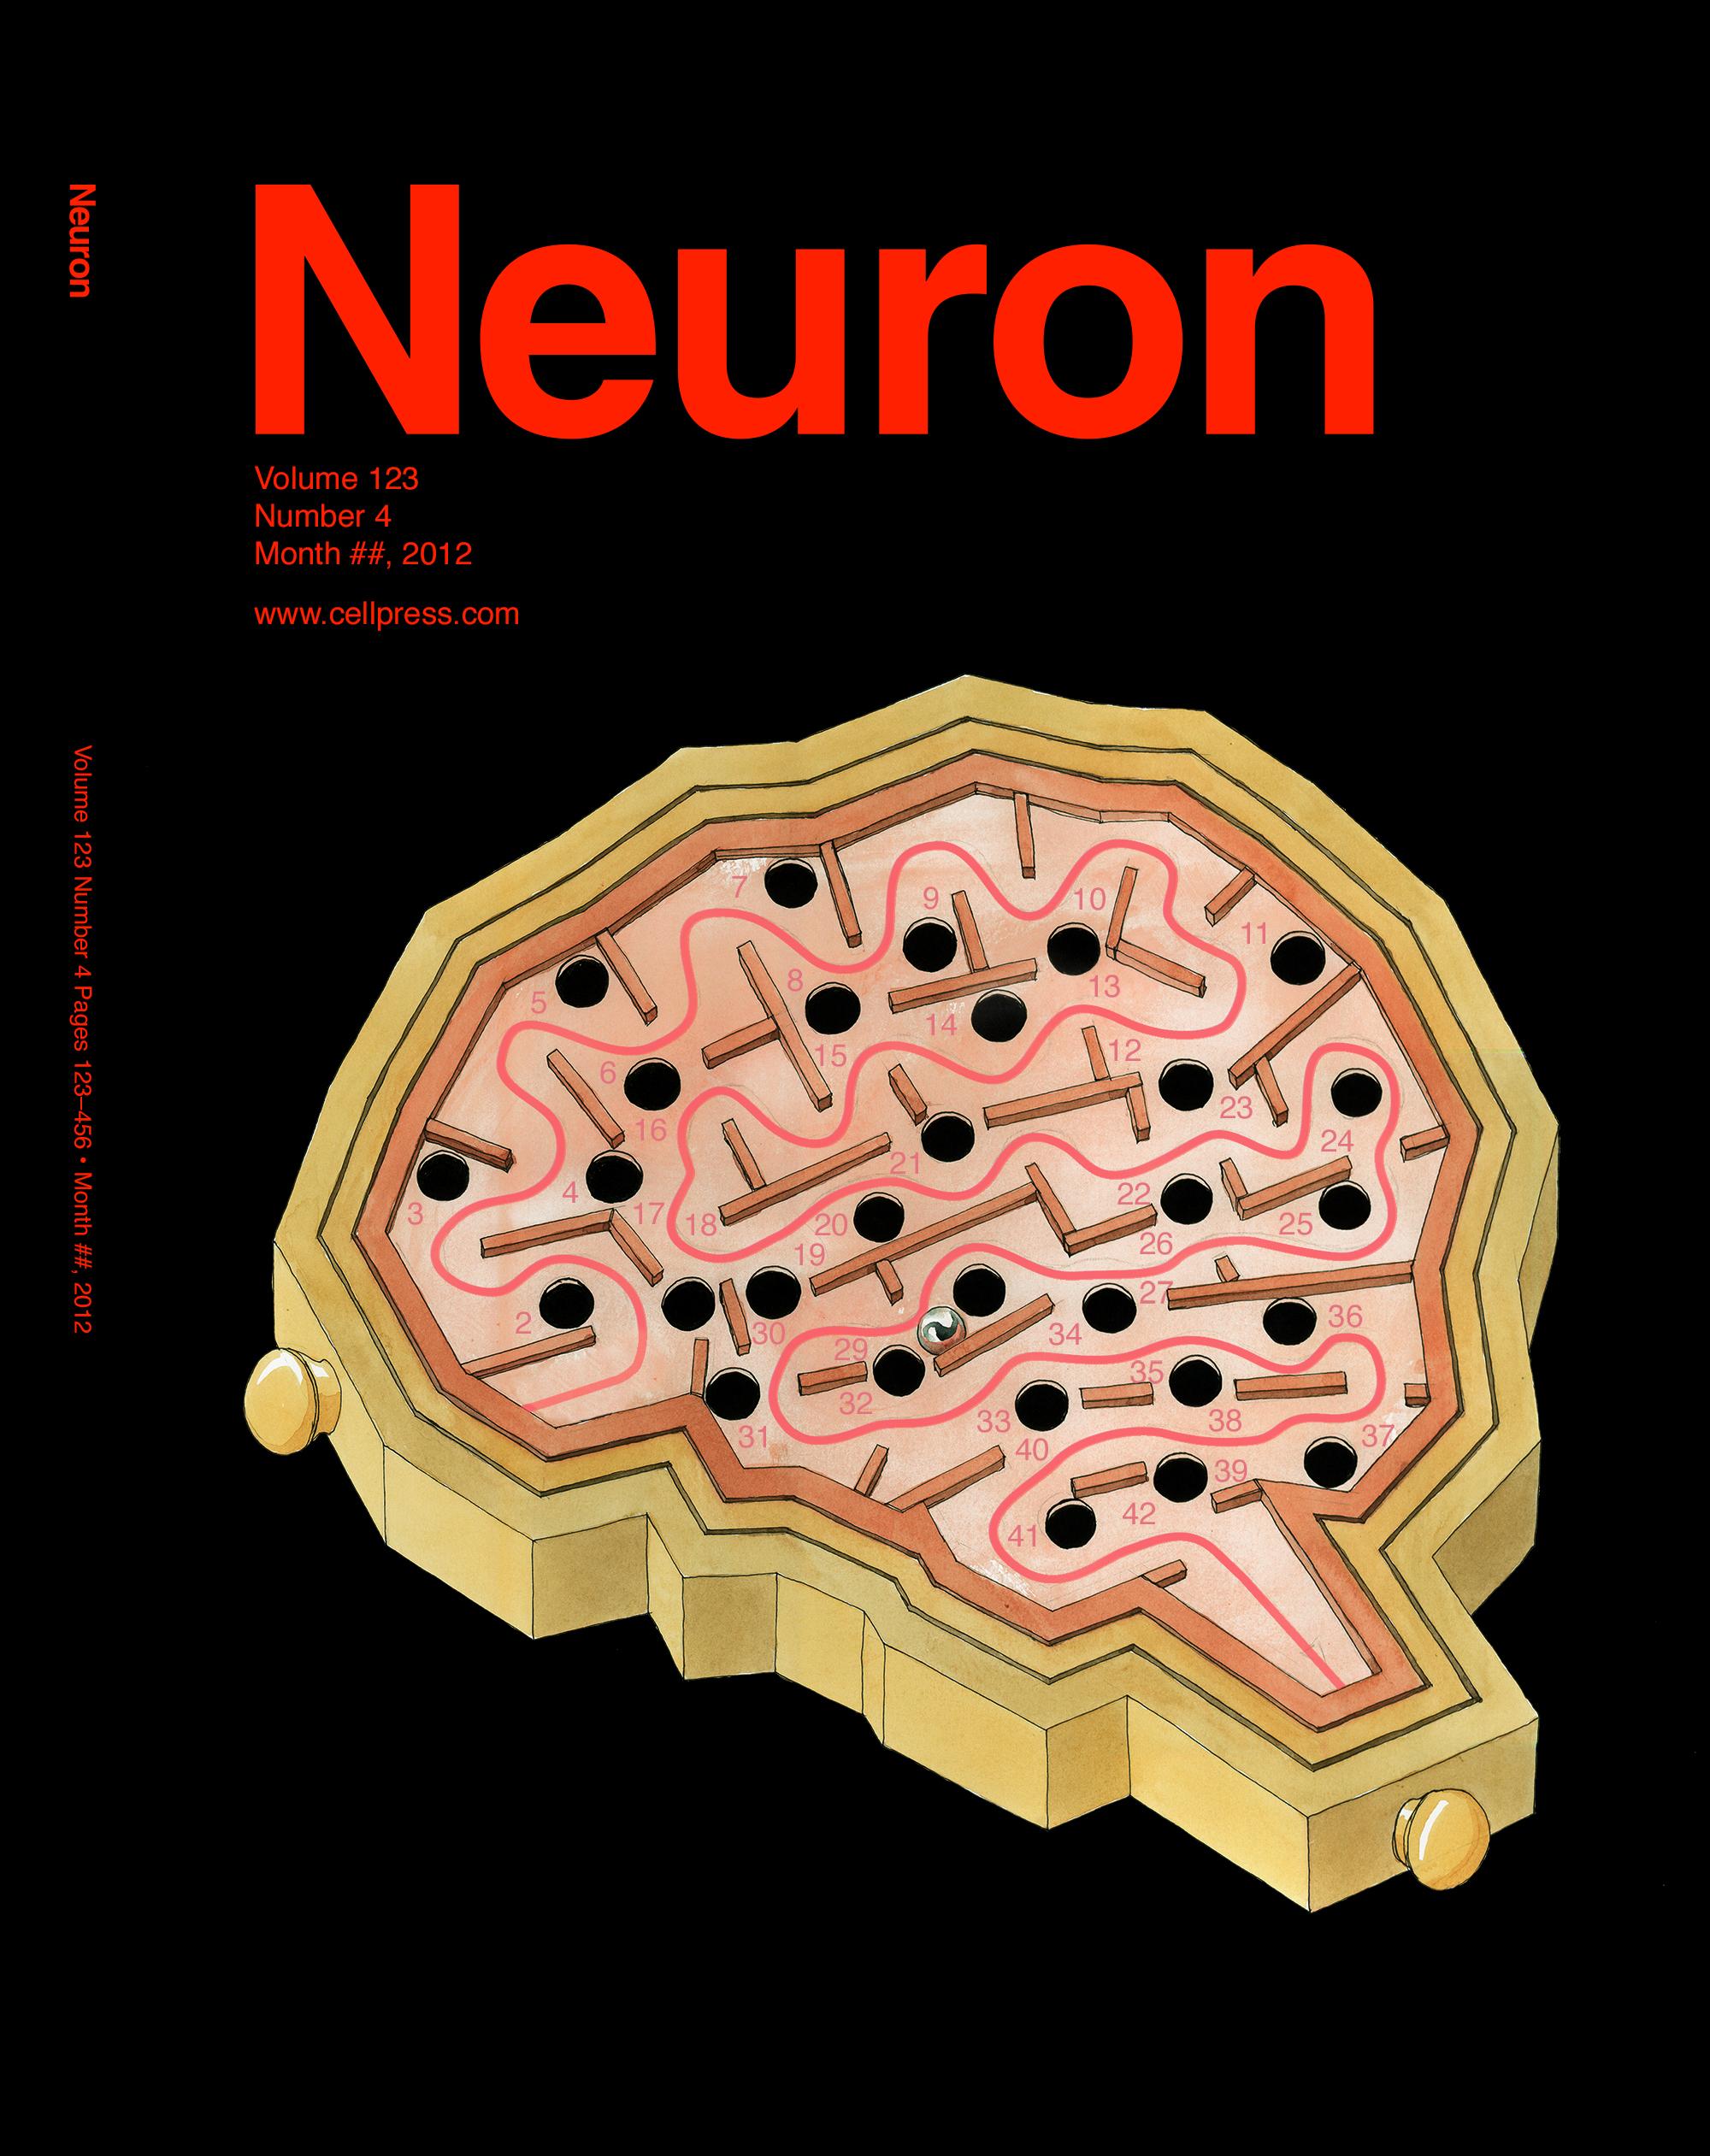 Cover - brain labyrnth v3 (small).jpg